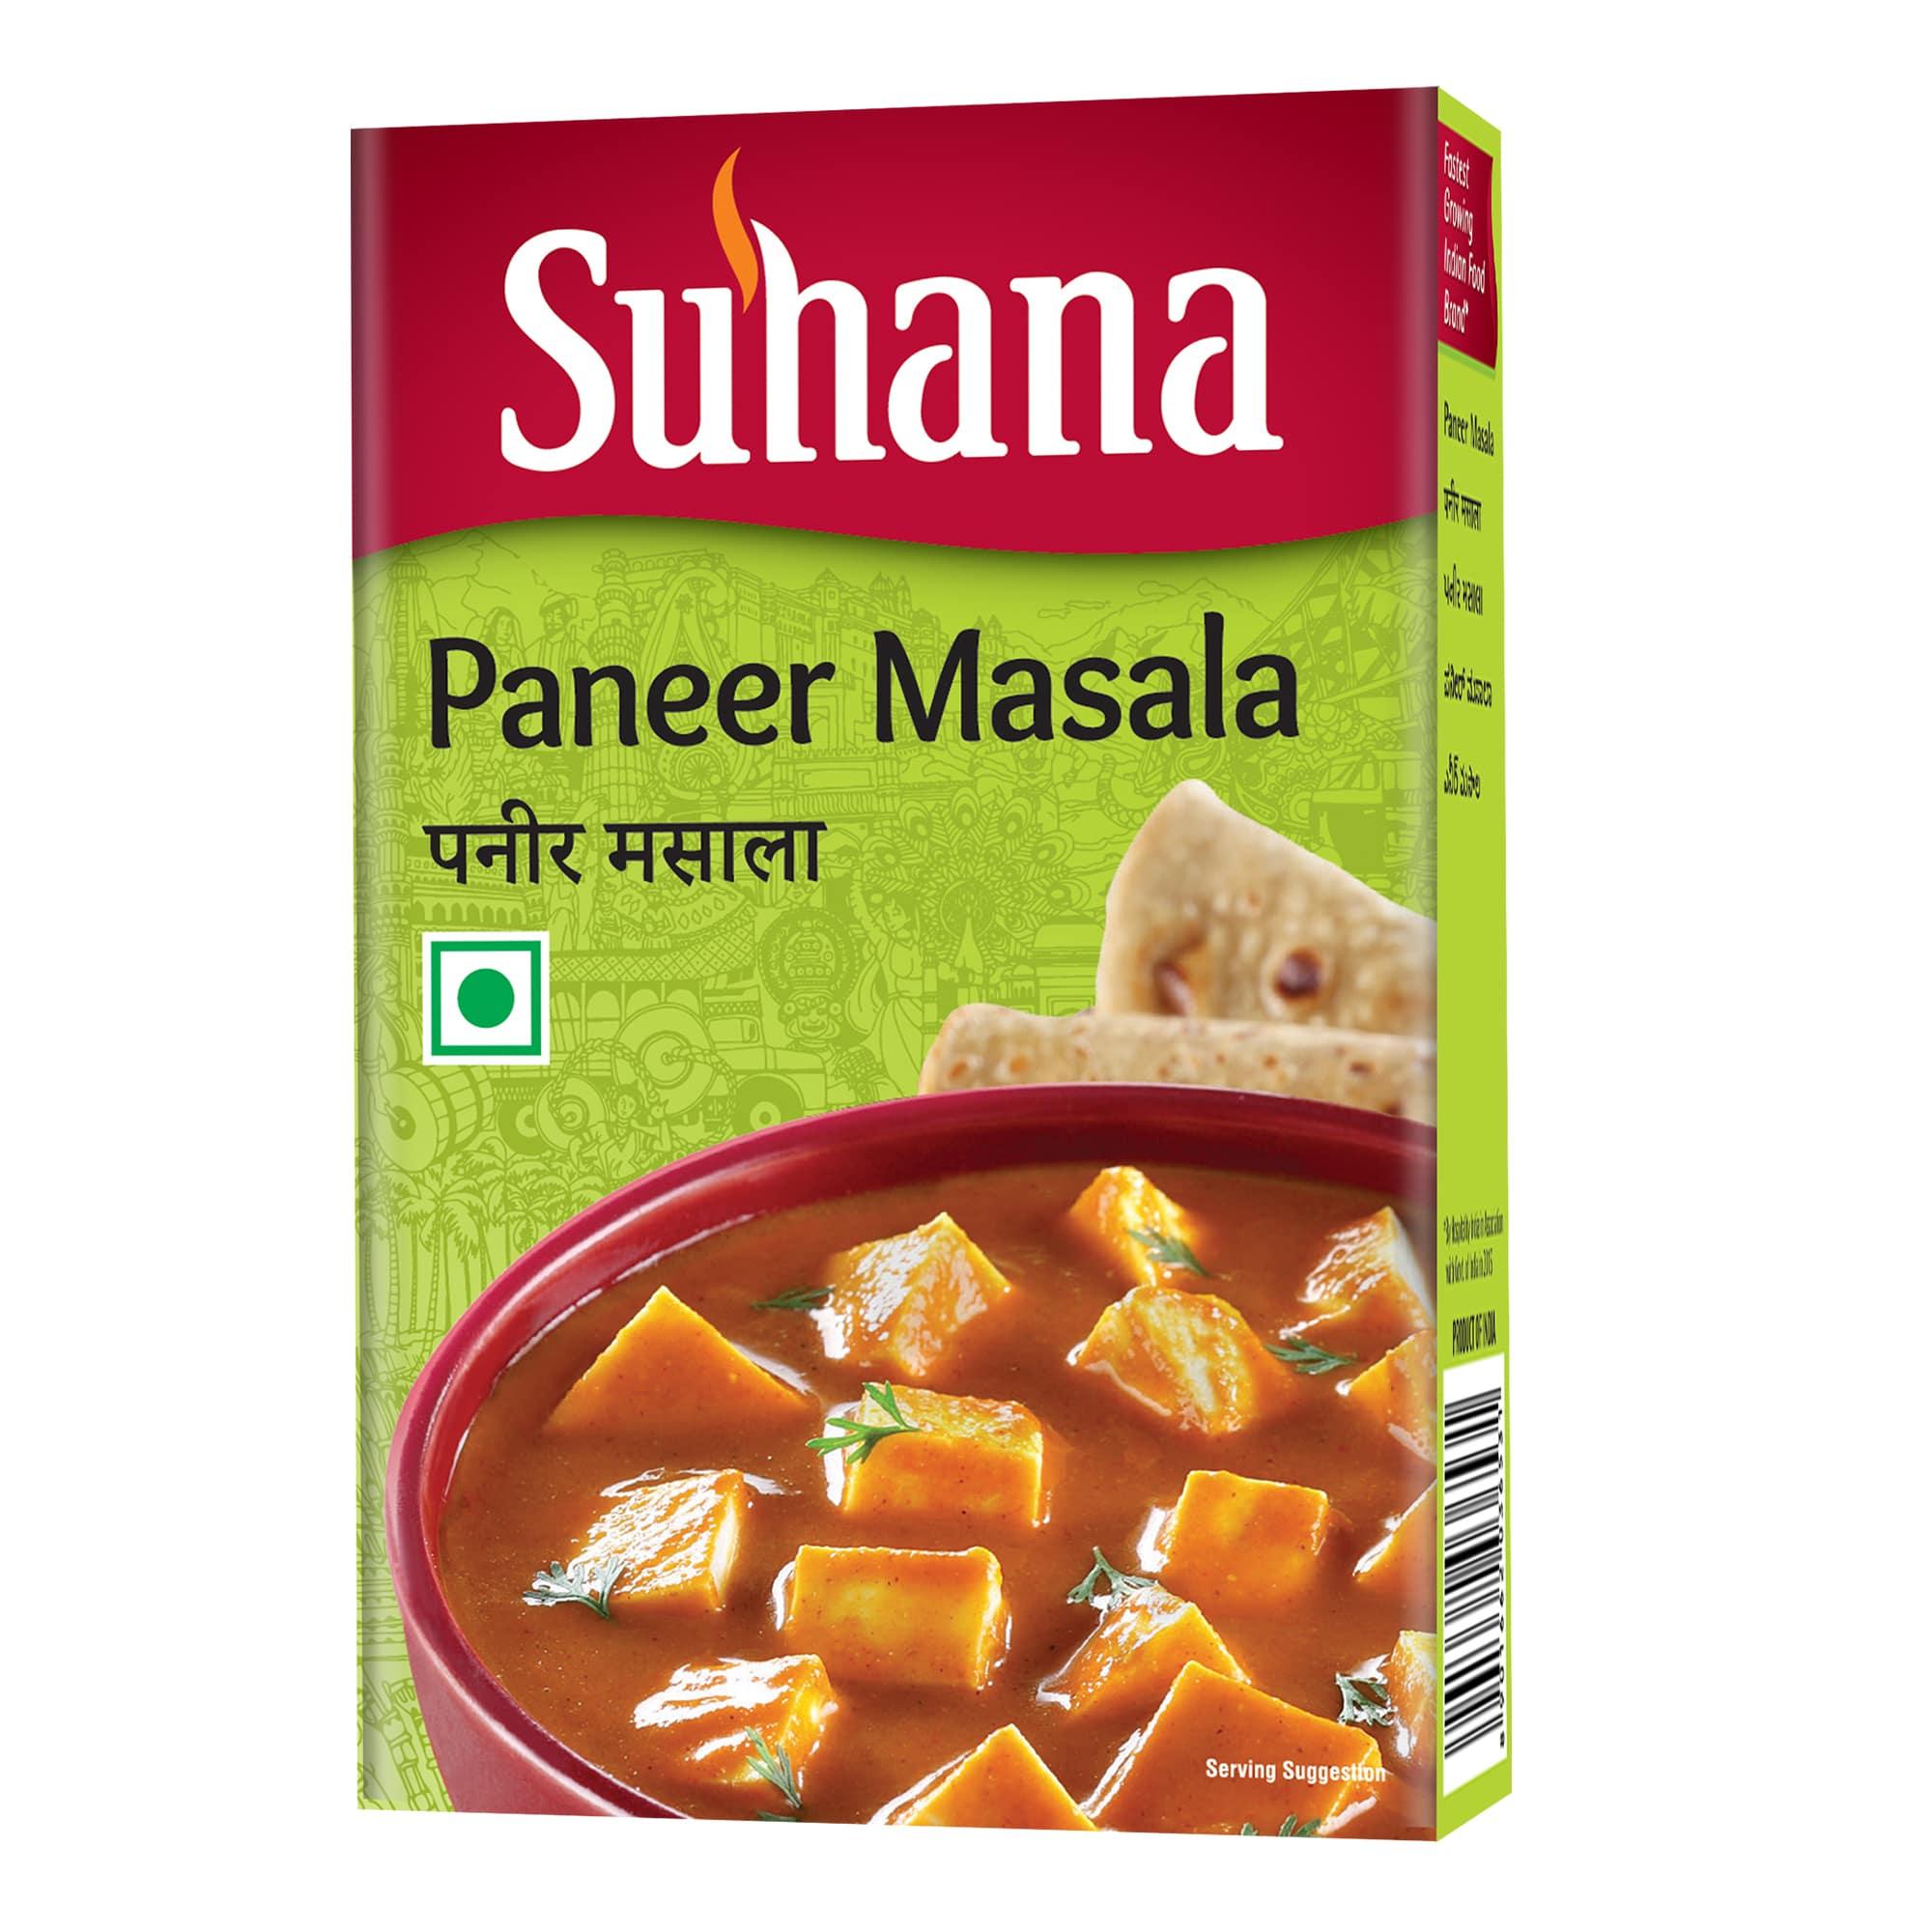 Suhana Paneer Masala 50 g